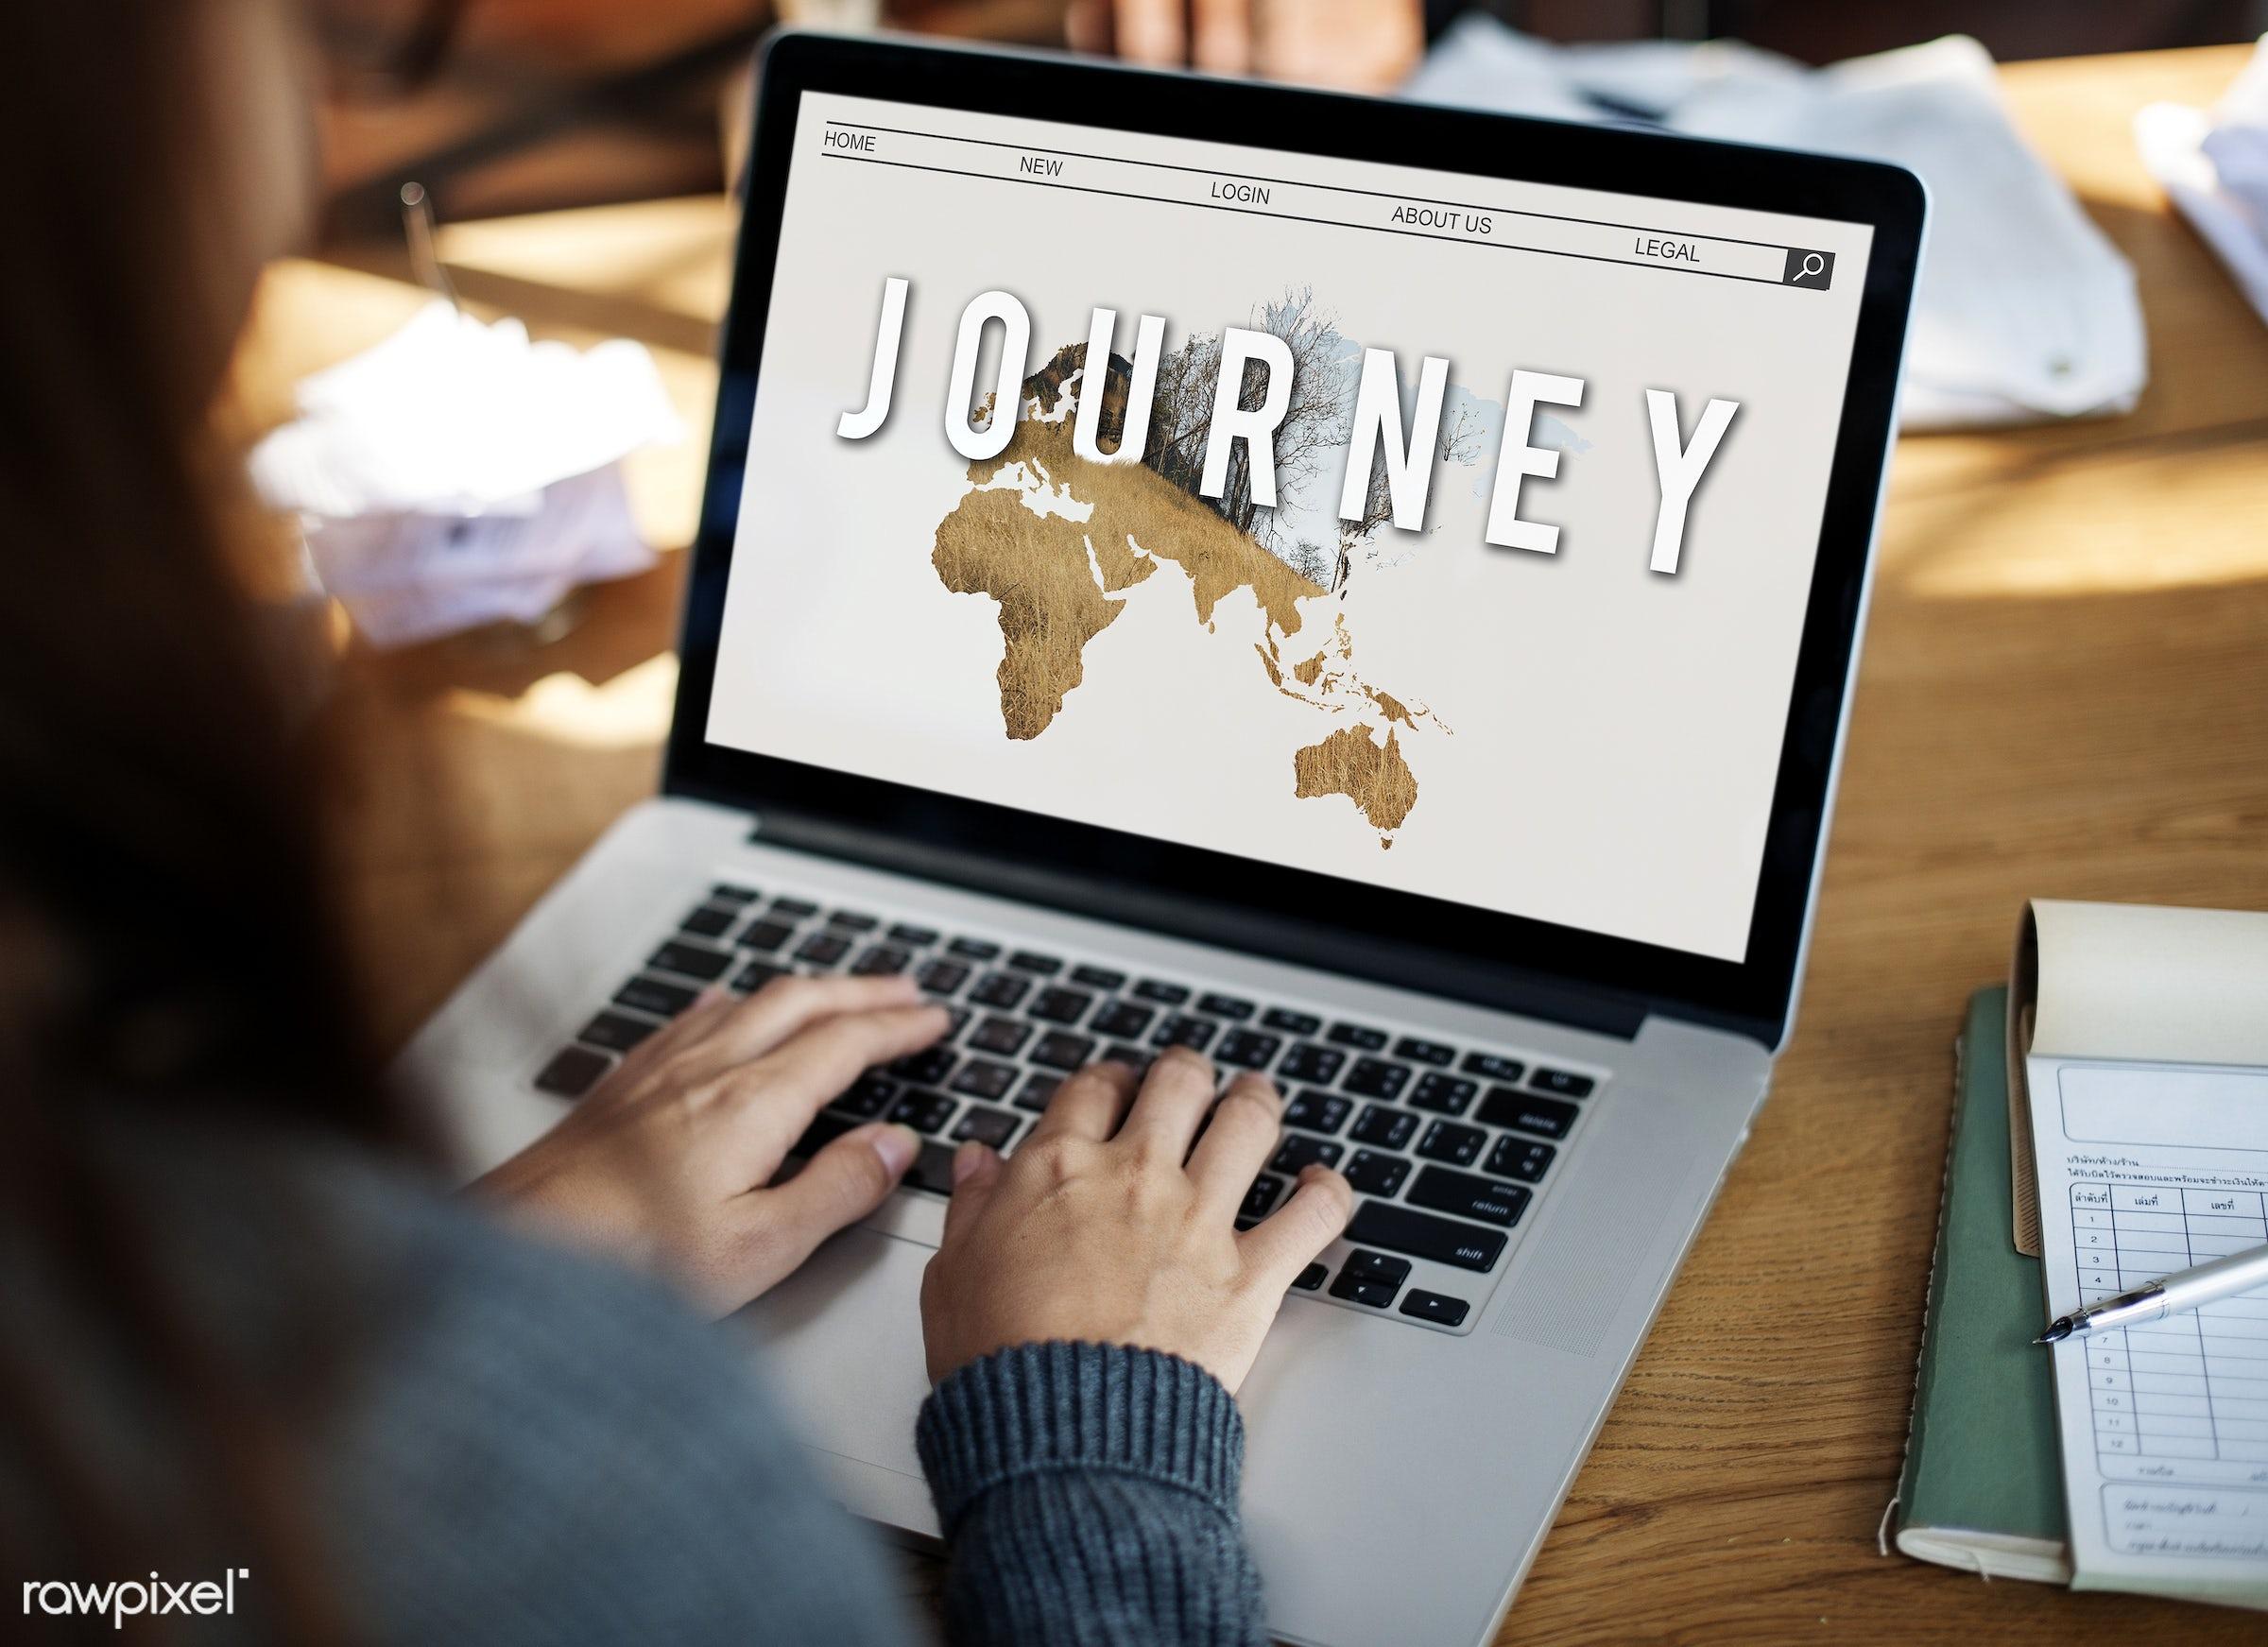 adventure, browsing, design, destination, device, digital, digital device, directions, explore, global, graphic, hands,...